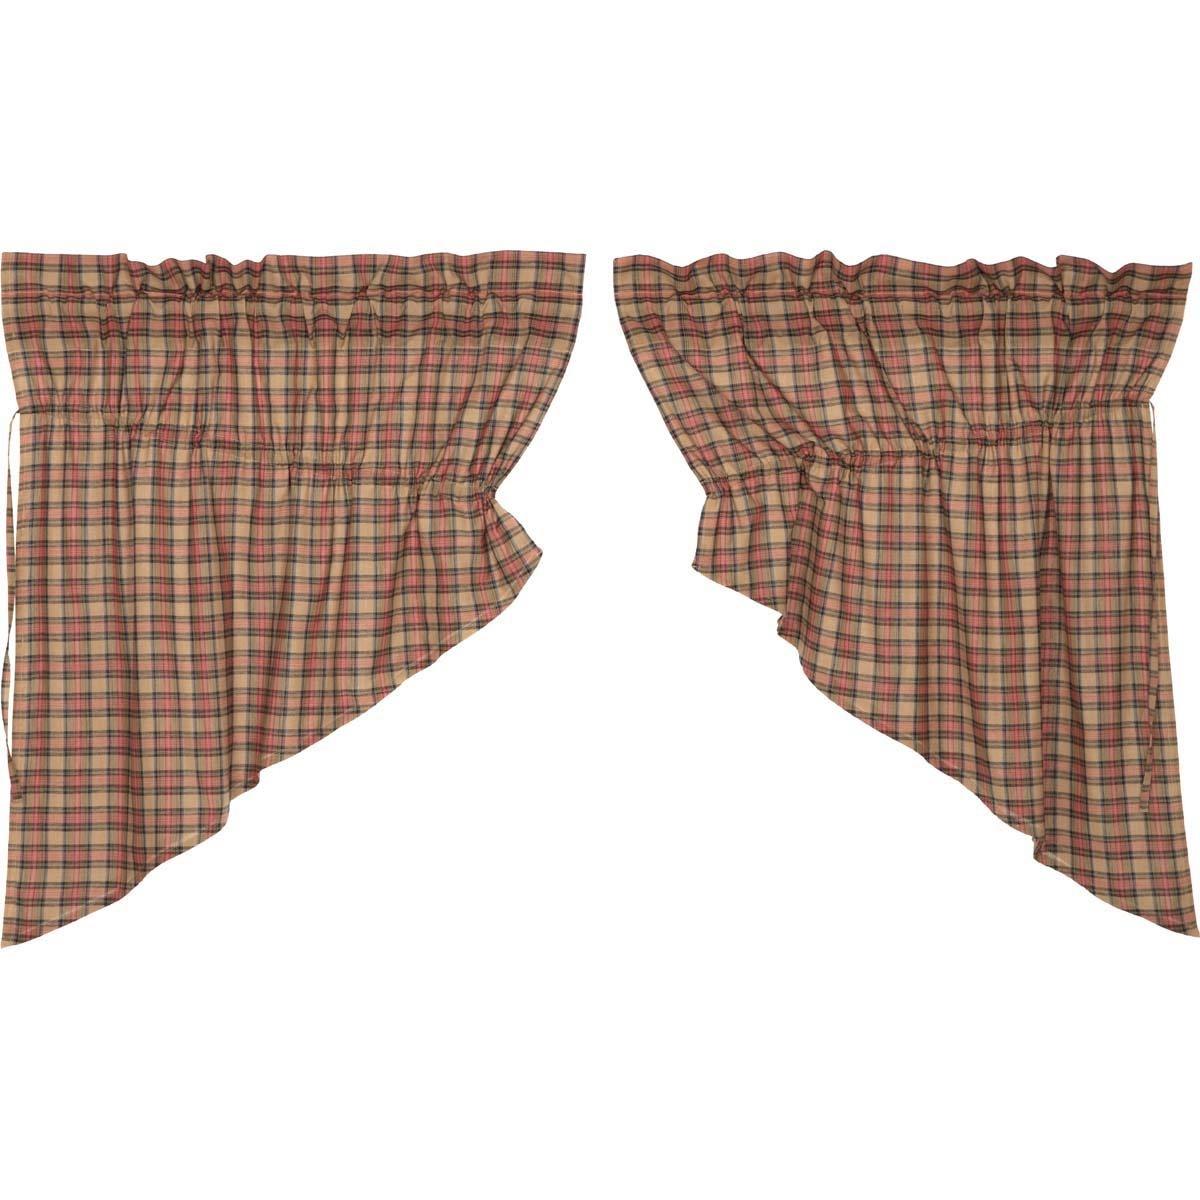 VHC Brands Primitive Kitchen Curtains Cinnamon Rod Pocket Cotton Drawstring Ties Plaid Prairie Swag Pair, Natural Tan